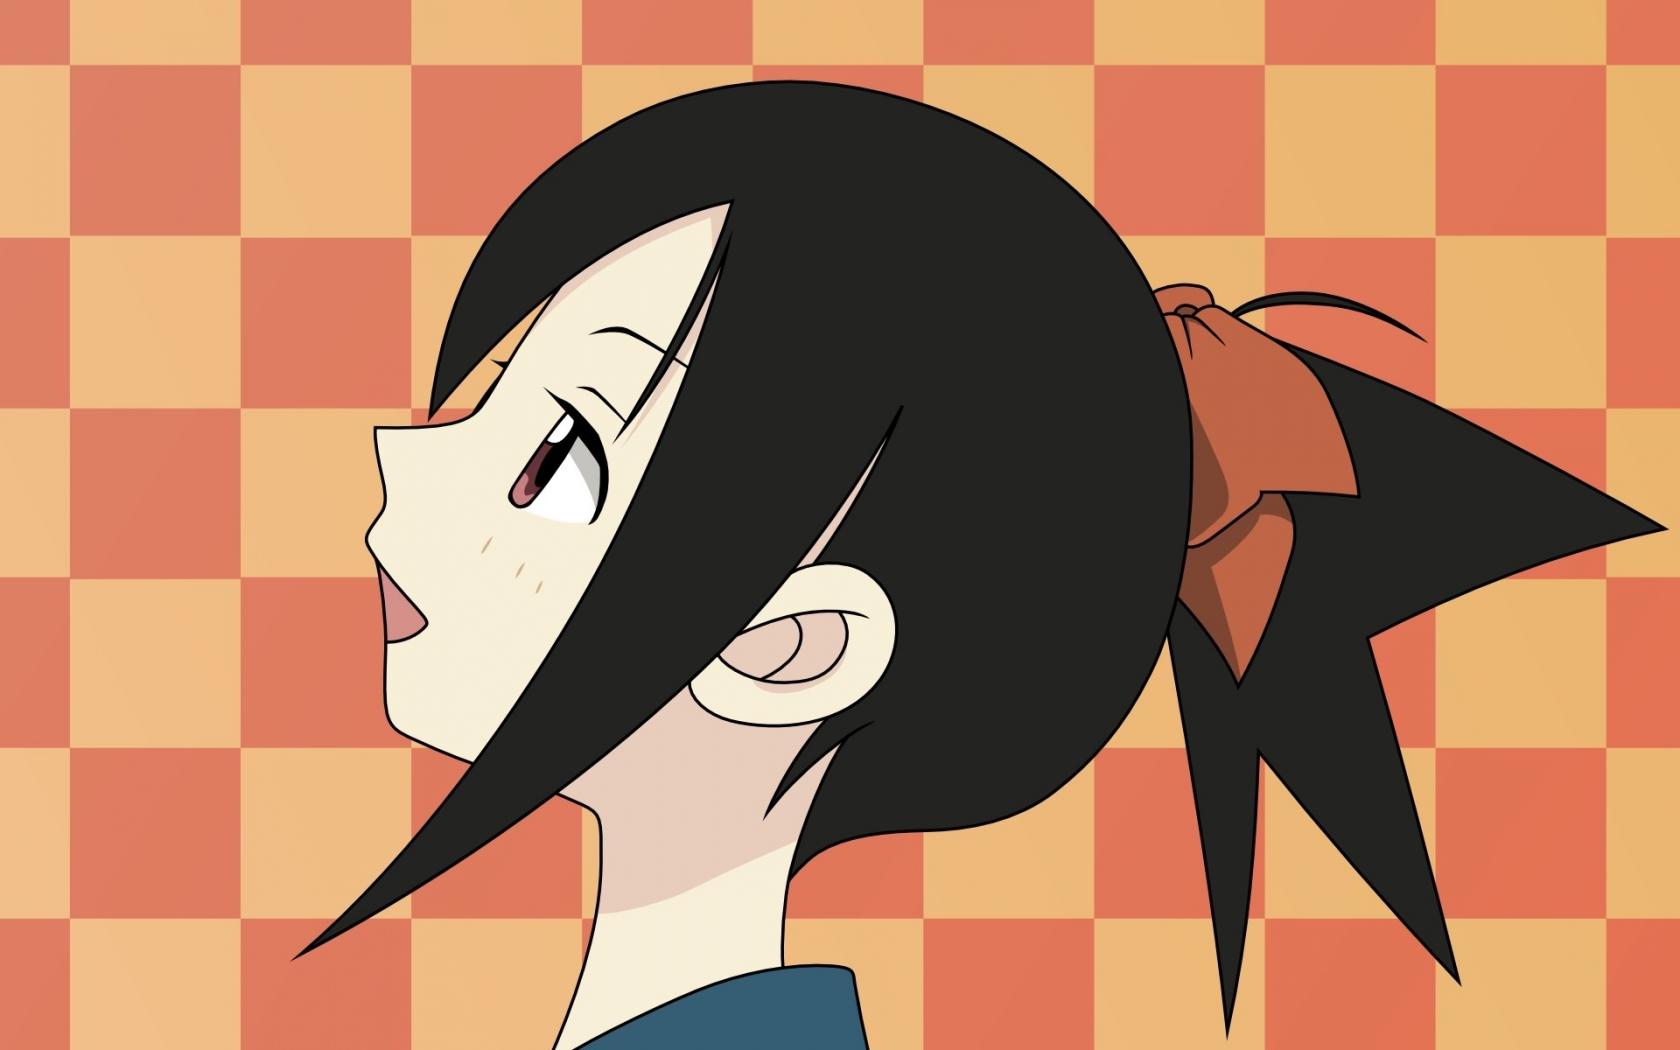 Nezu Miko - 1680x1050